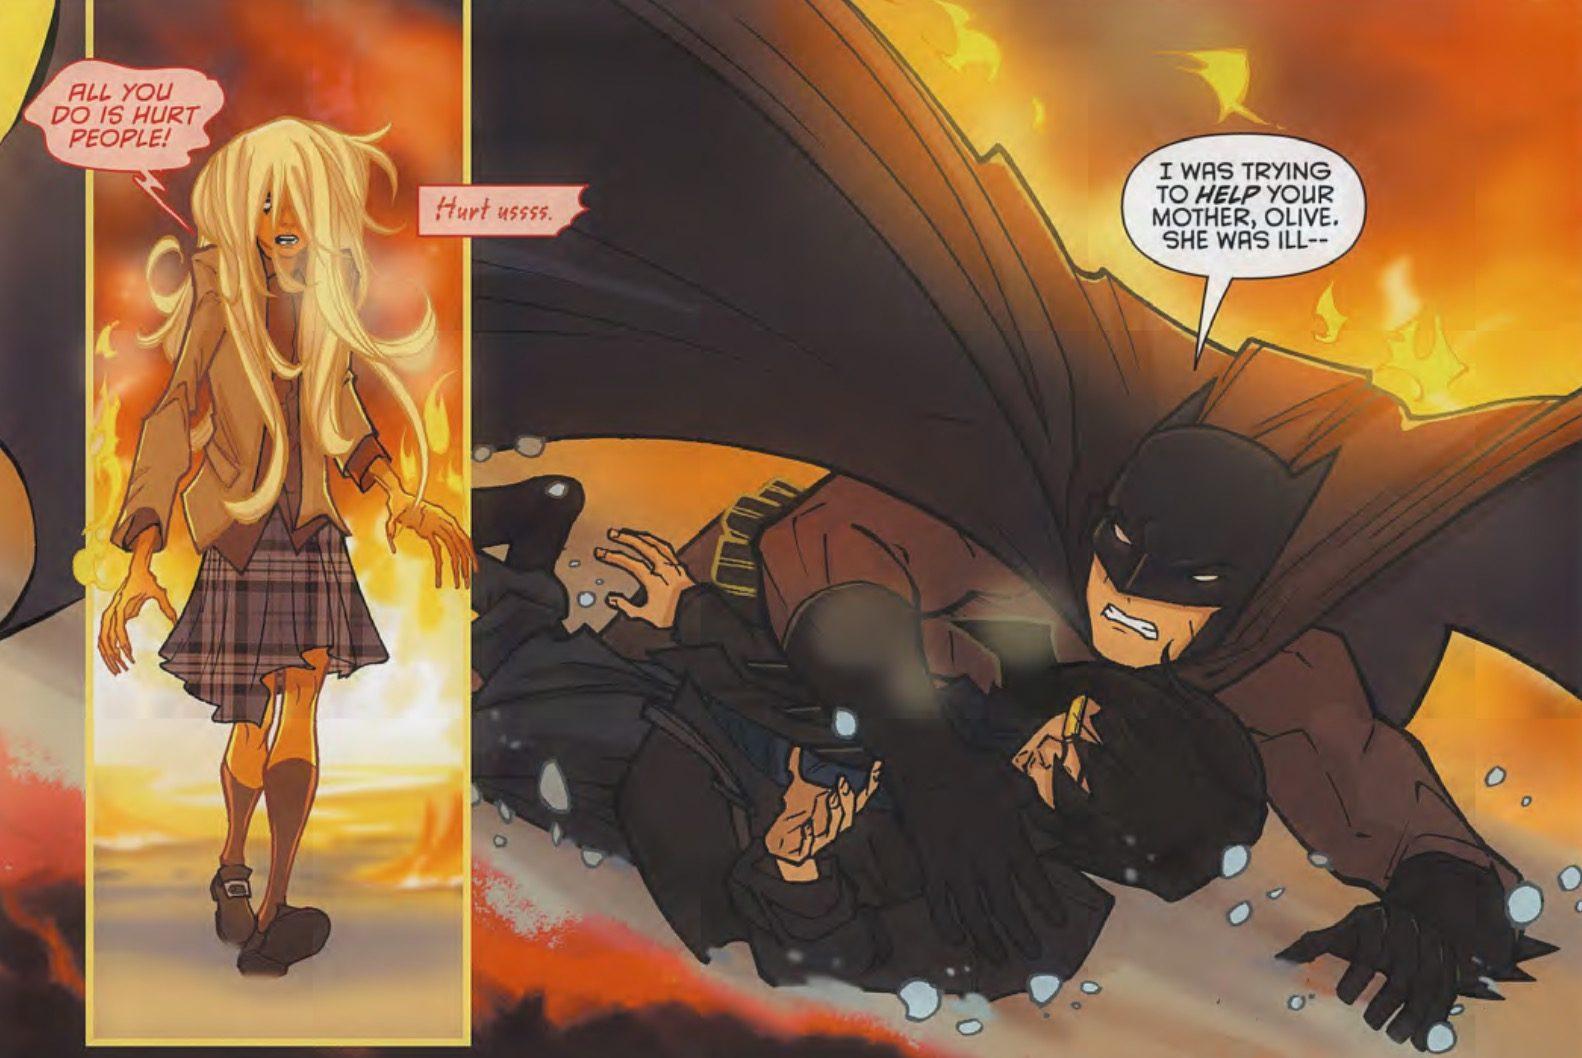 Gotham Academy Second Semester #8 Panel 2